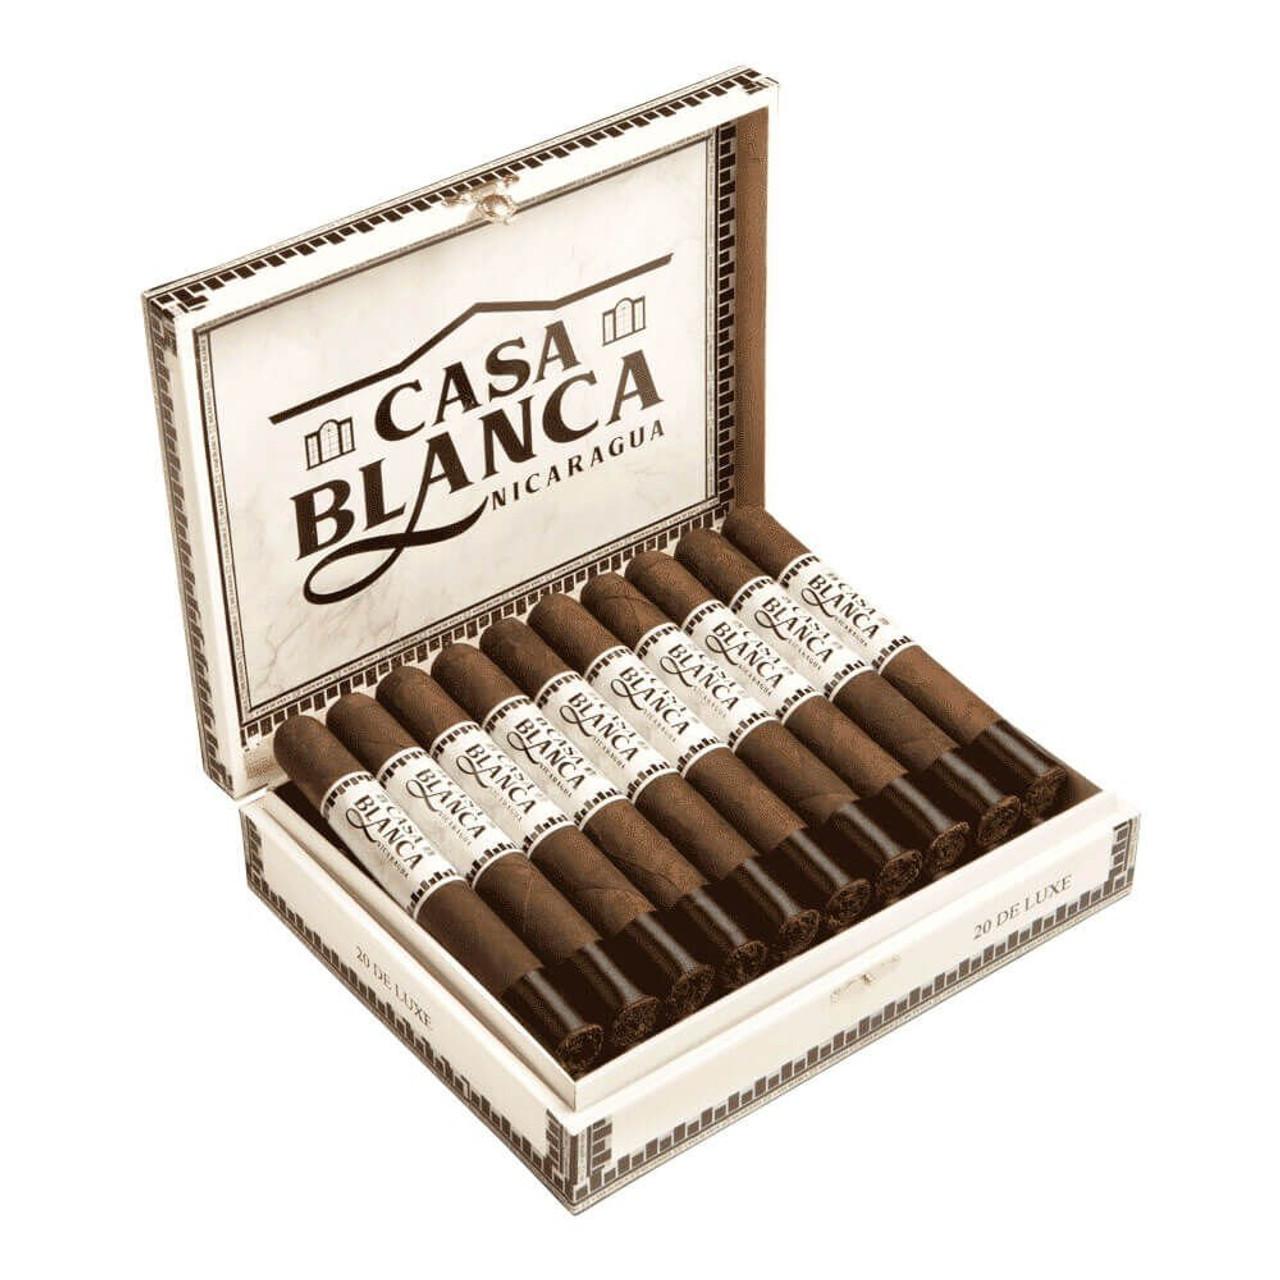 Casa Blanca Nicaragua Lonsdale Maduro Cigars - 6.5 x 43 (Box of 20)